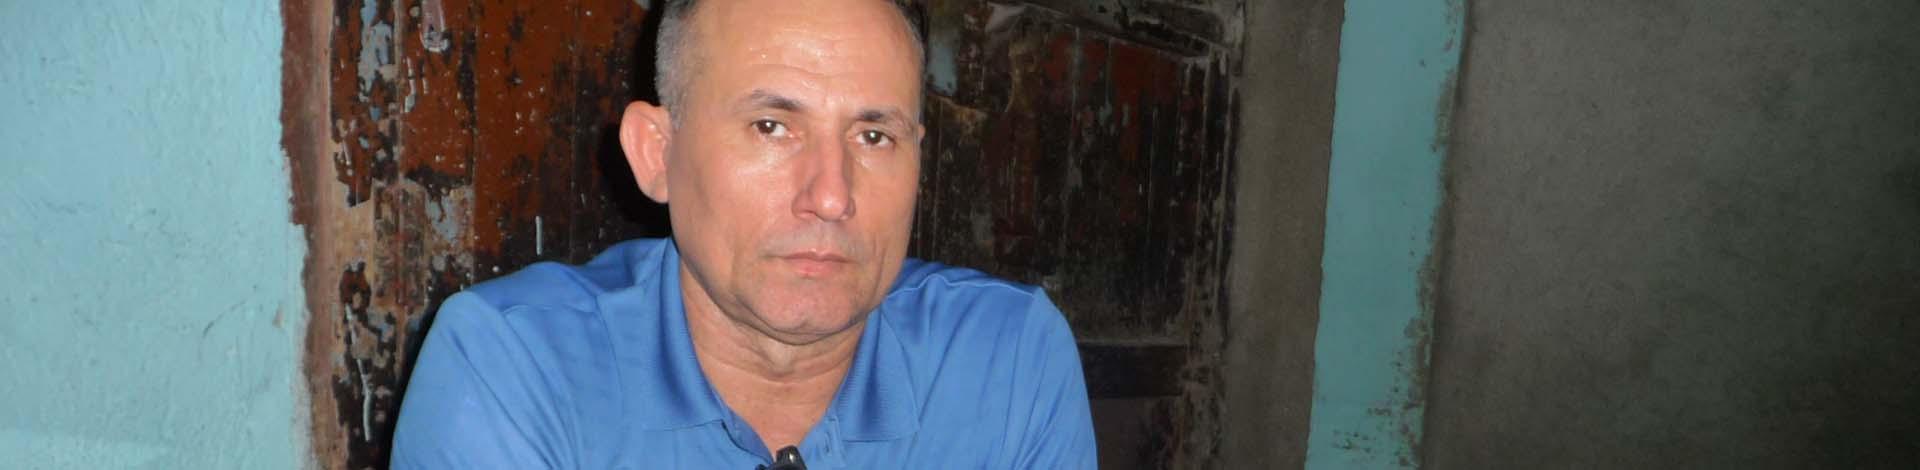 Kubas Oppositionsführer Daniel Ferrer im Hungerstreik